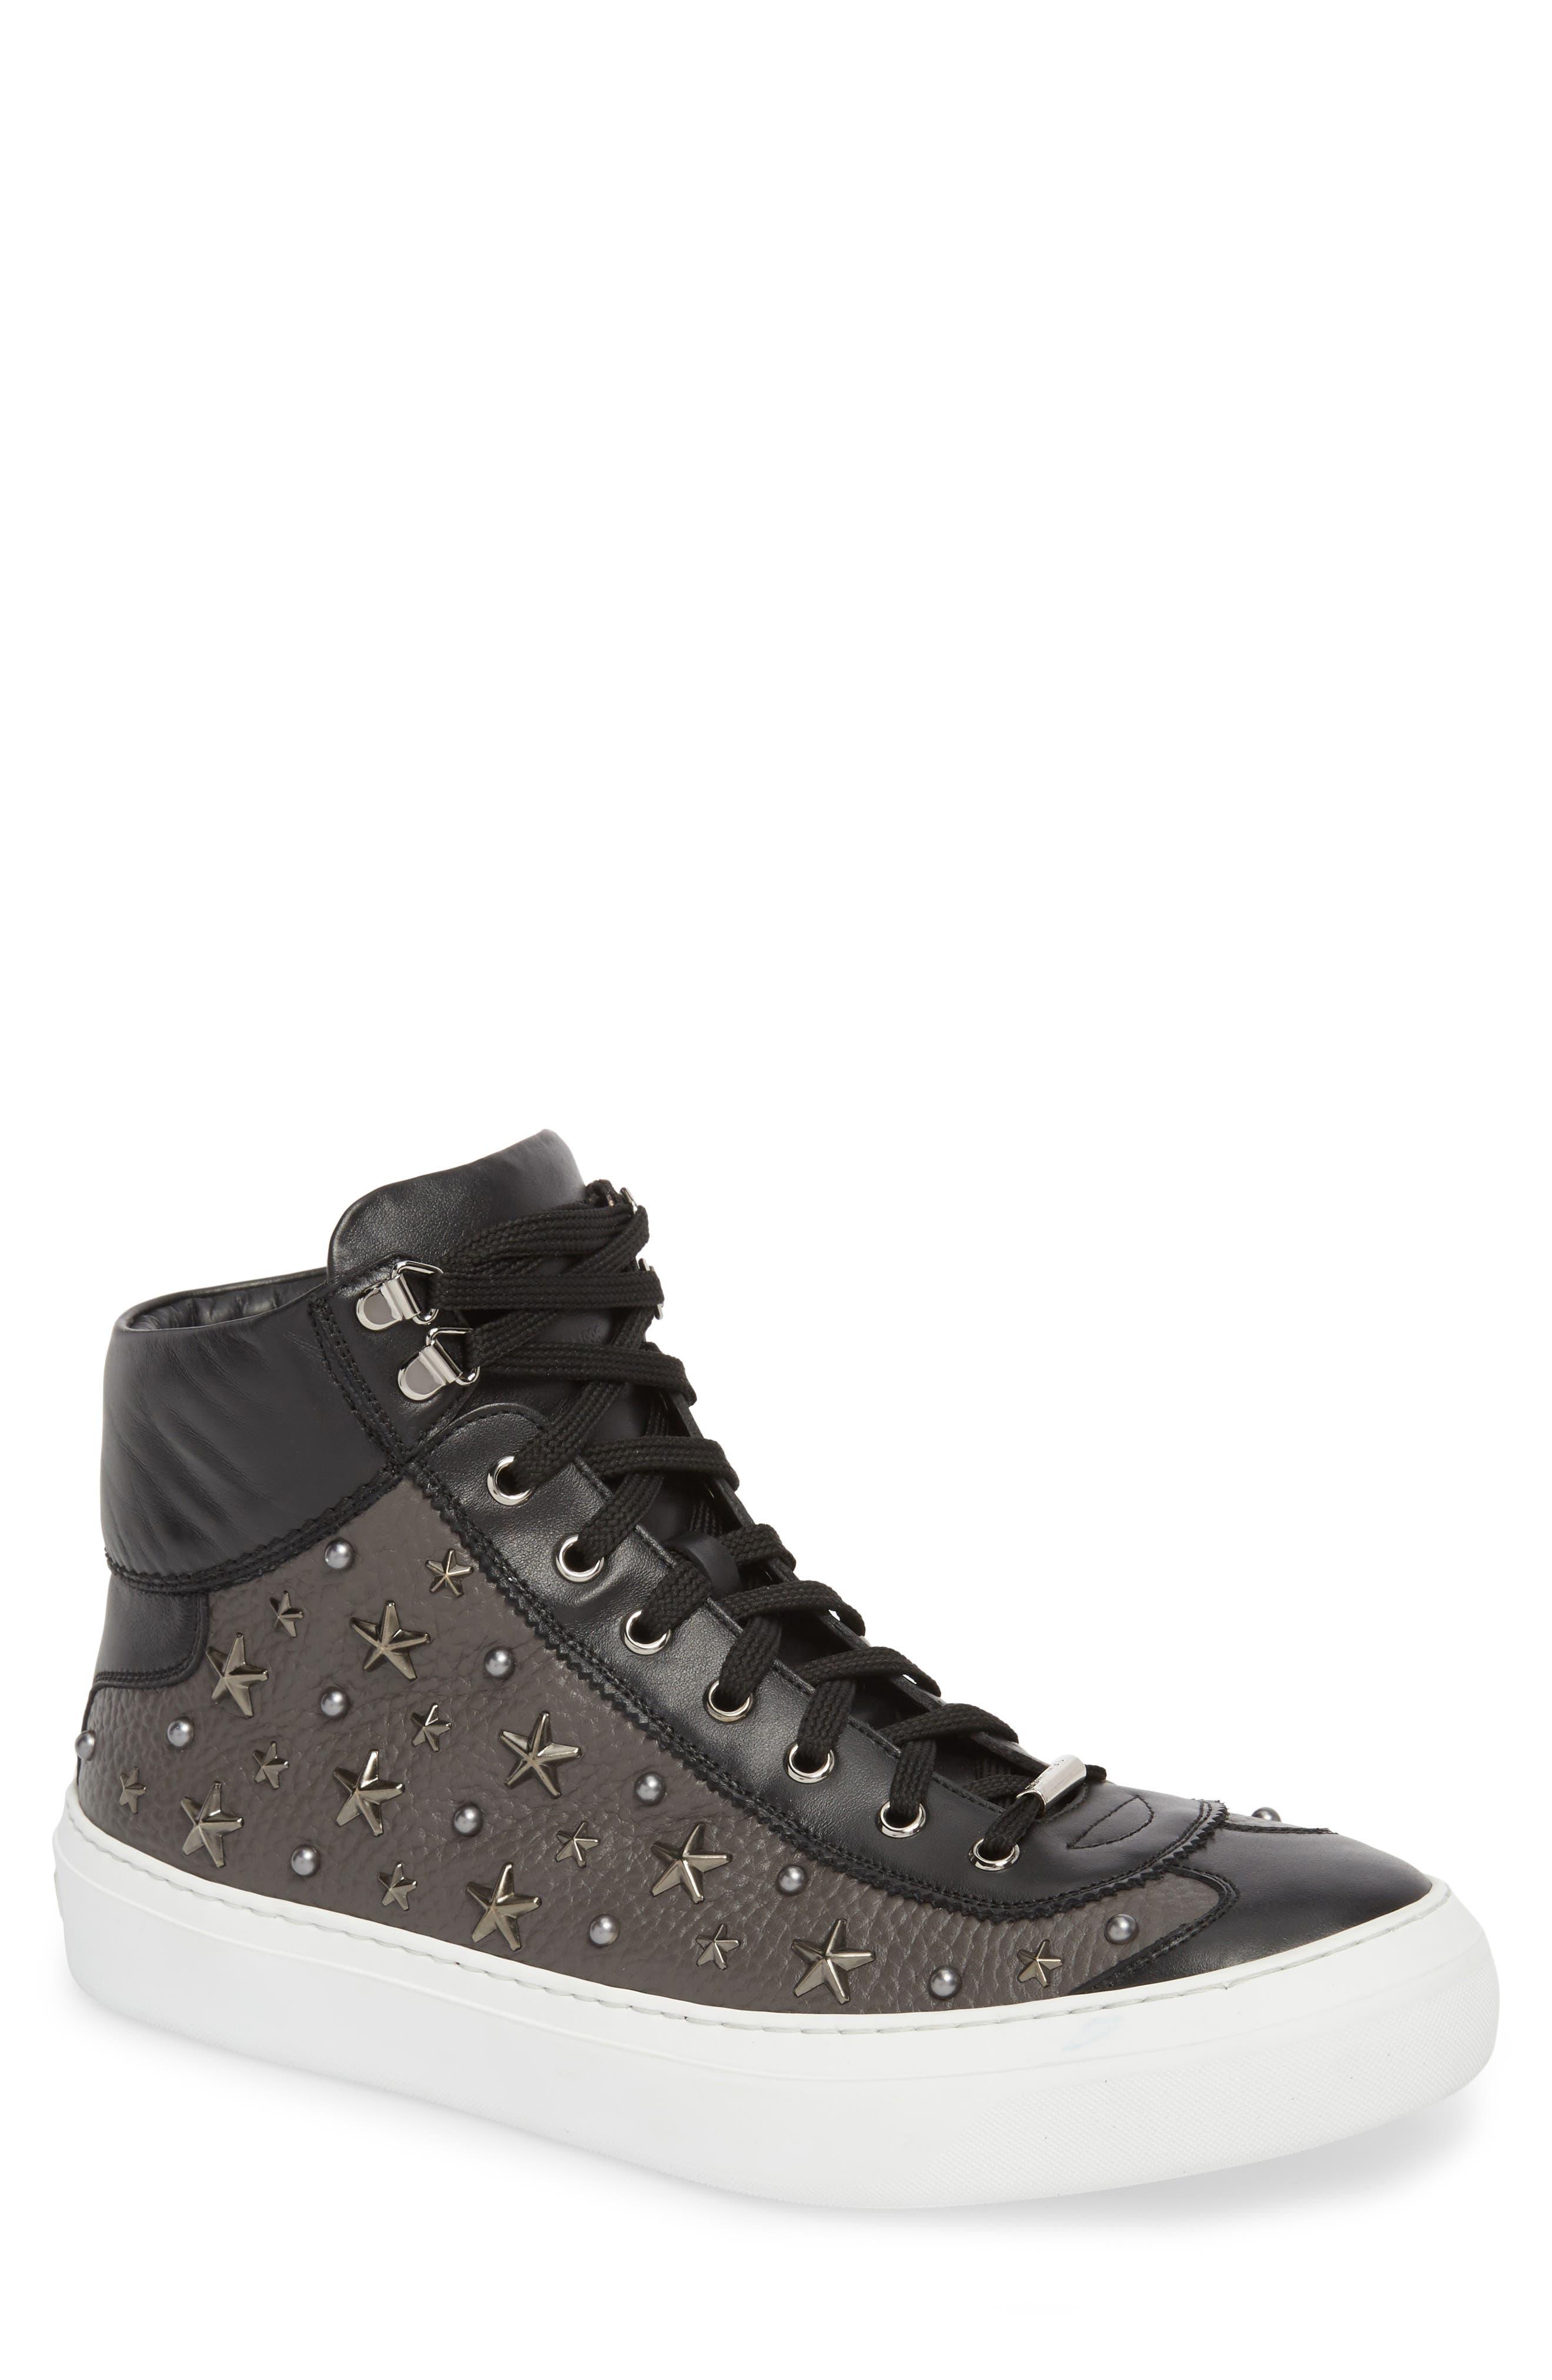 Argyle Sneaker,                         Main,                         color, 021